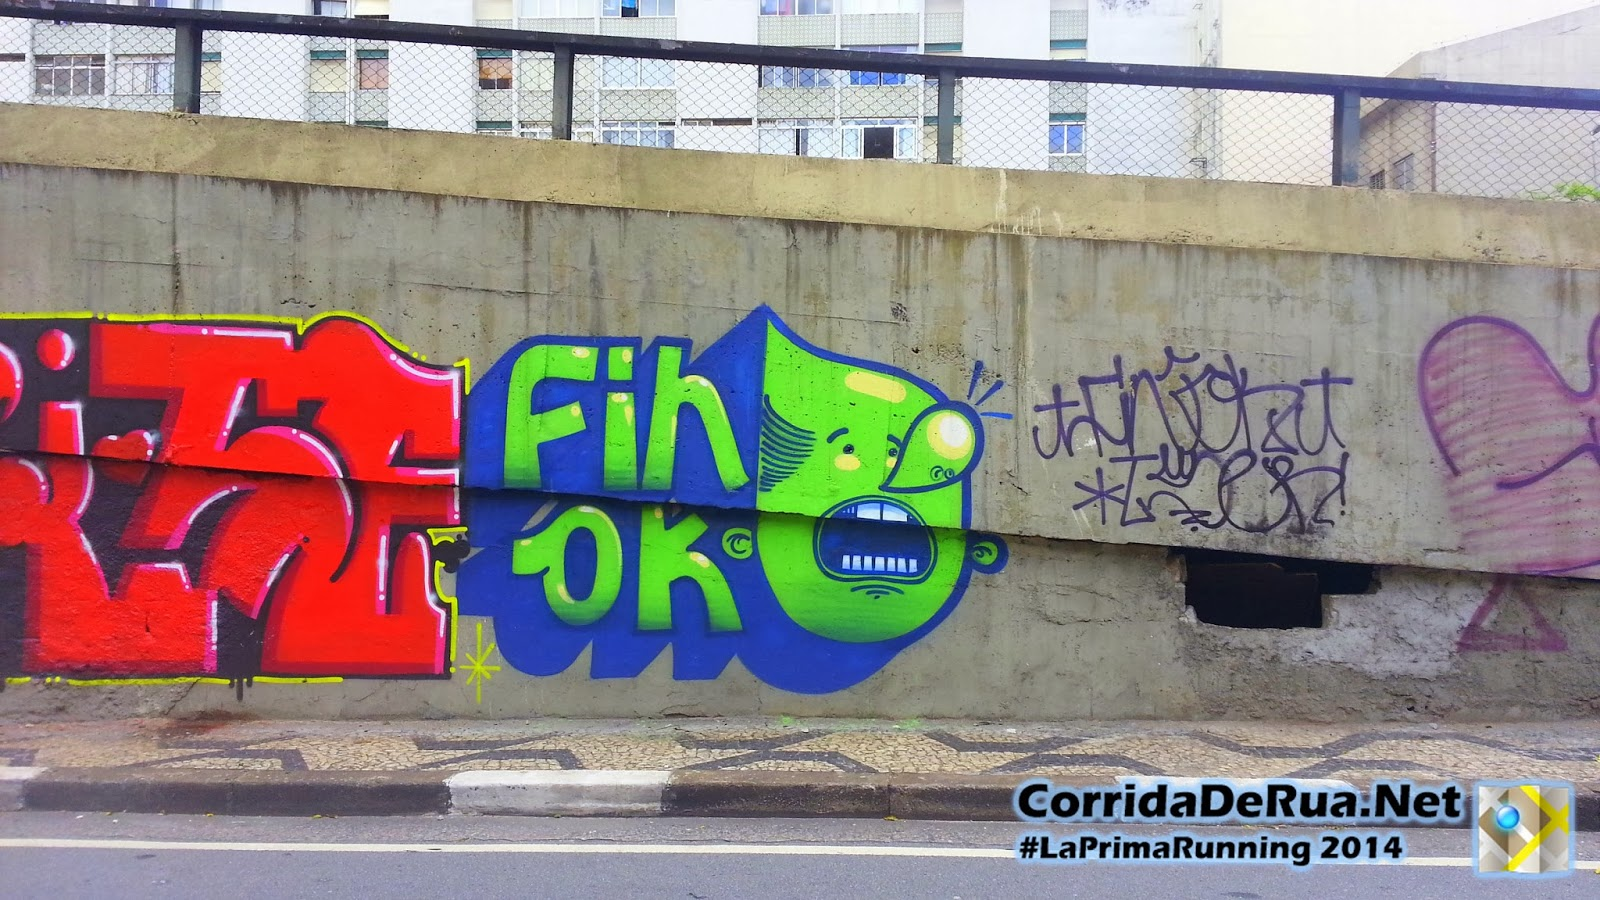 street art - Corrida De Rua